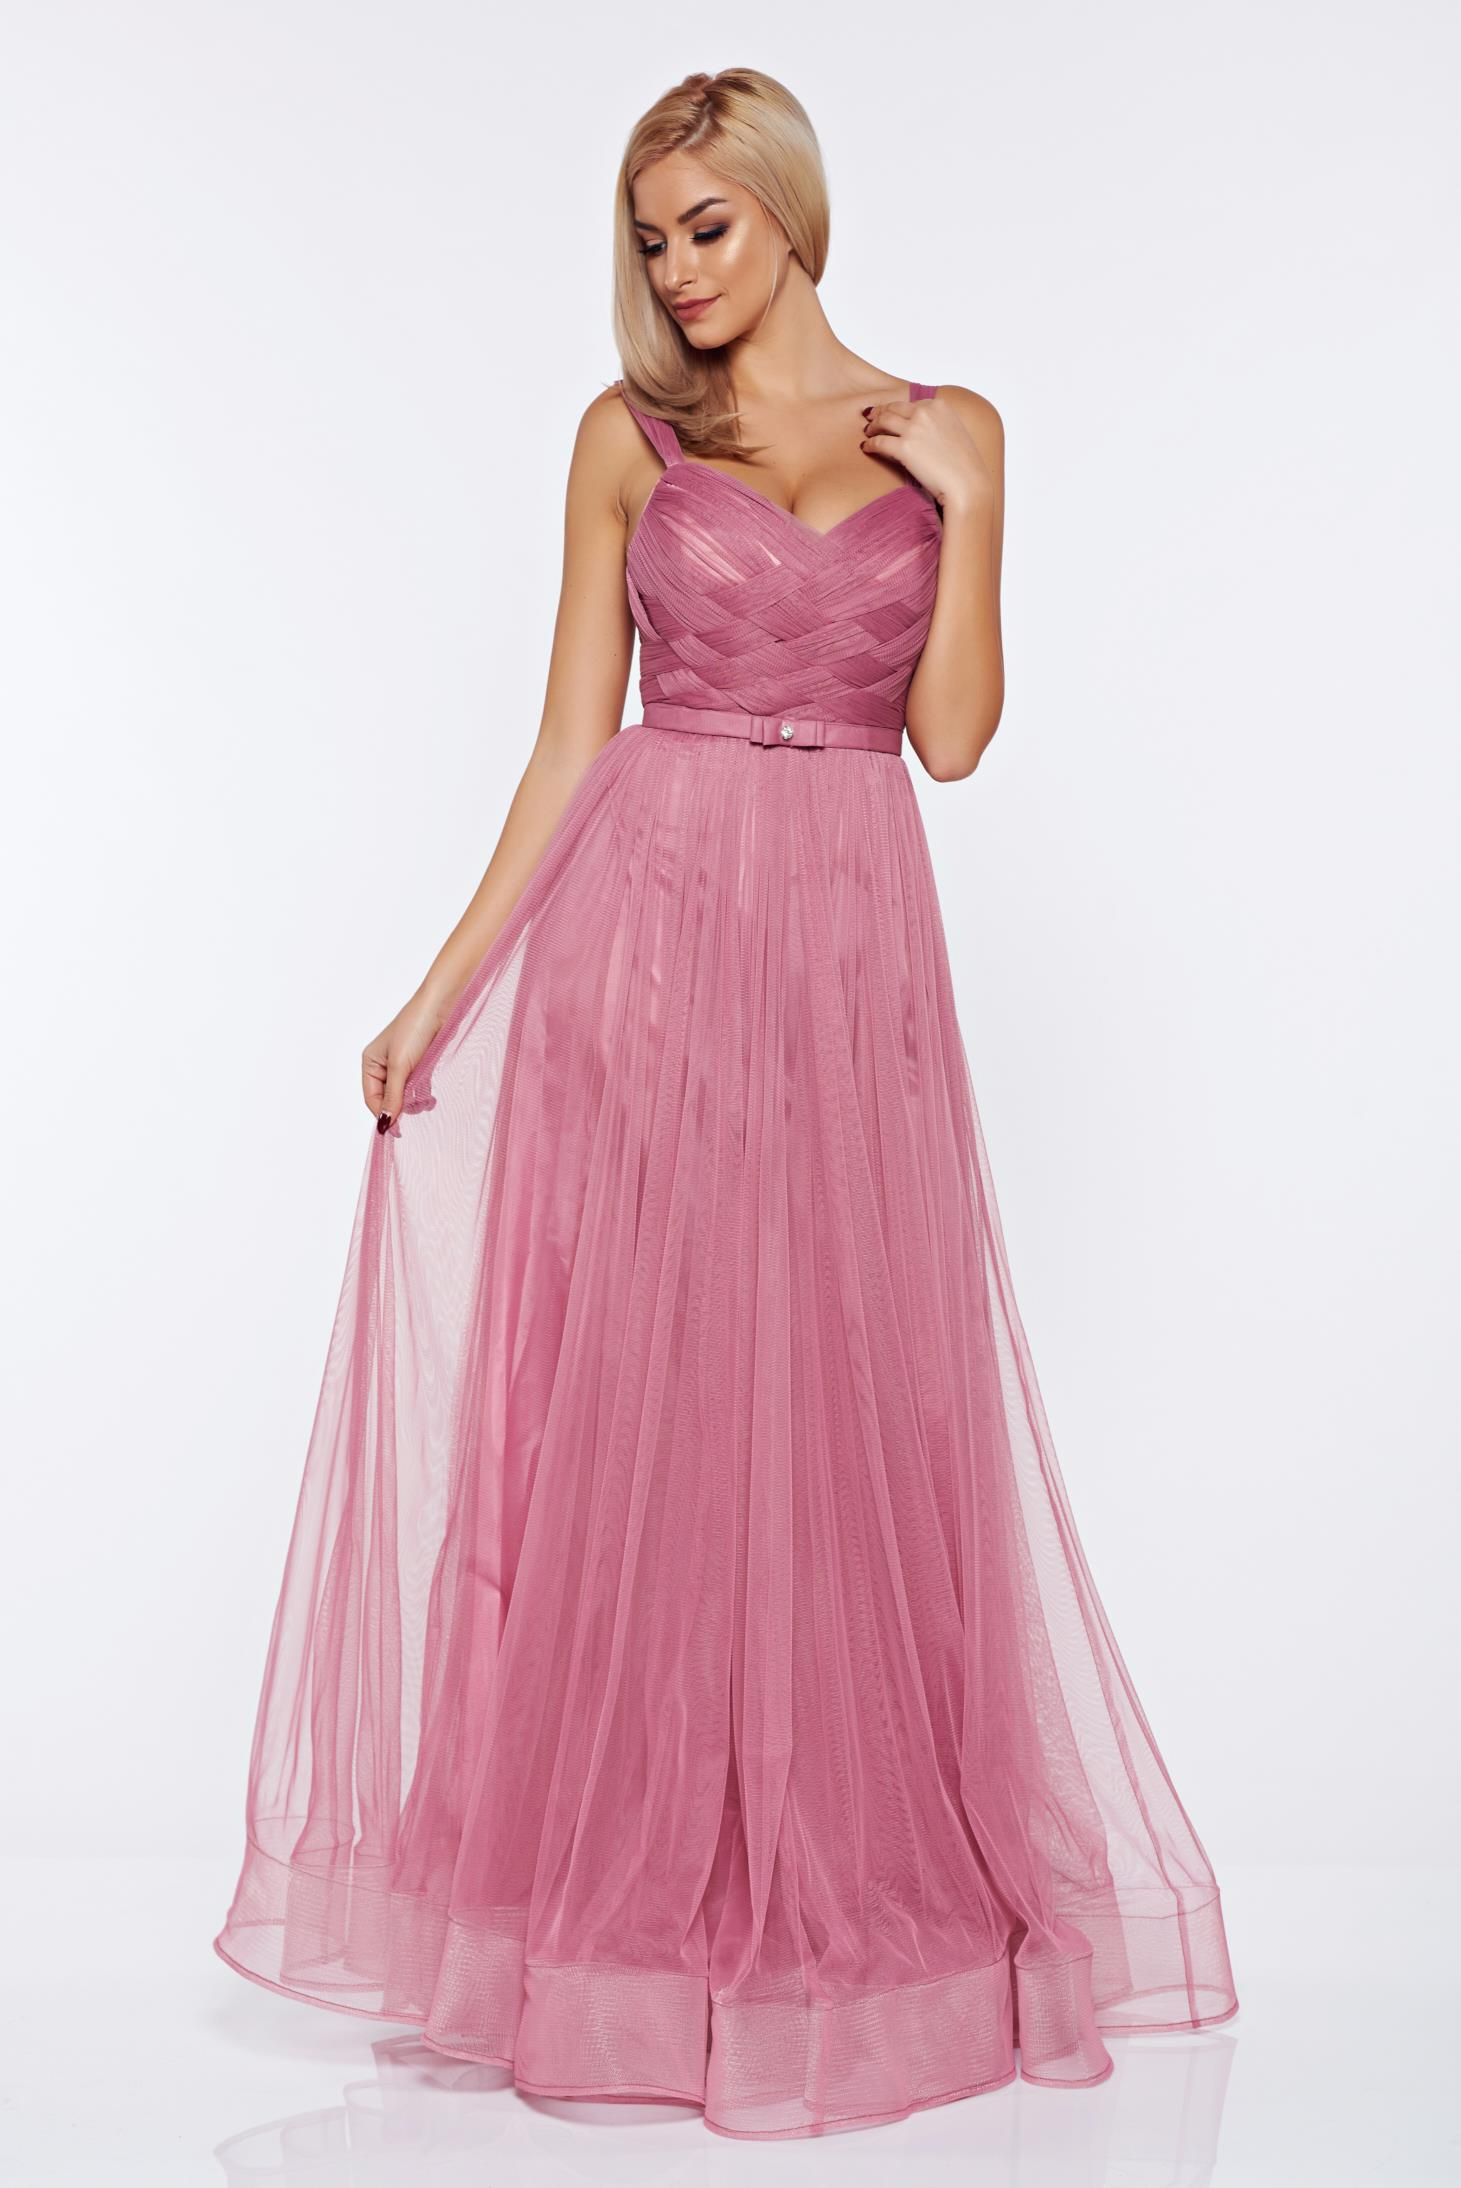 Waistband Dresses